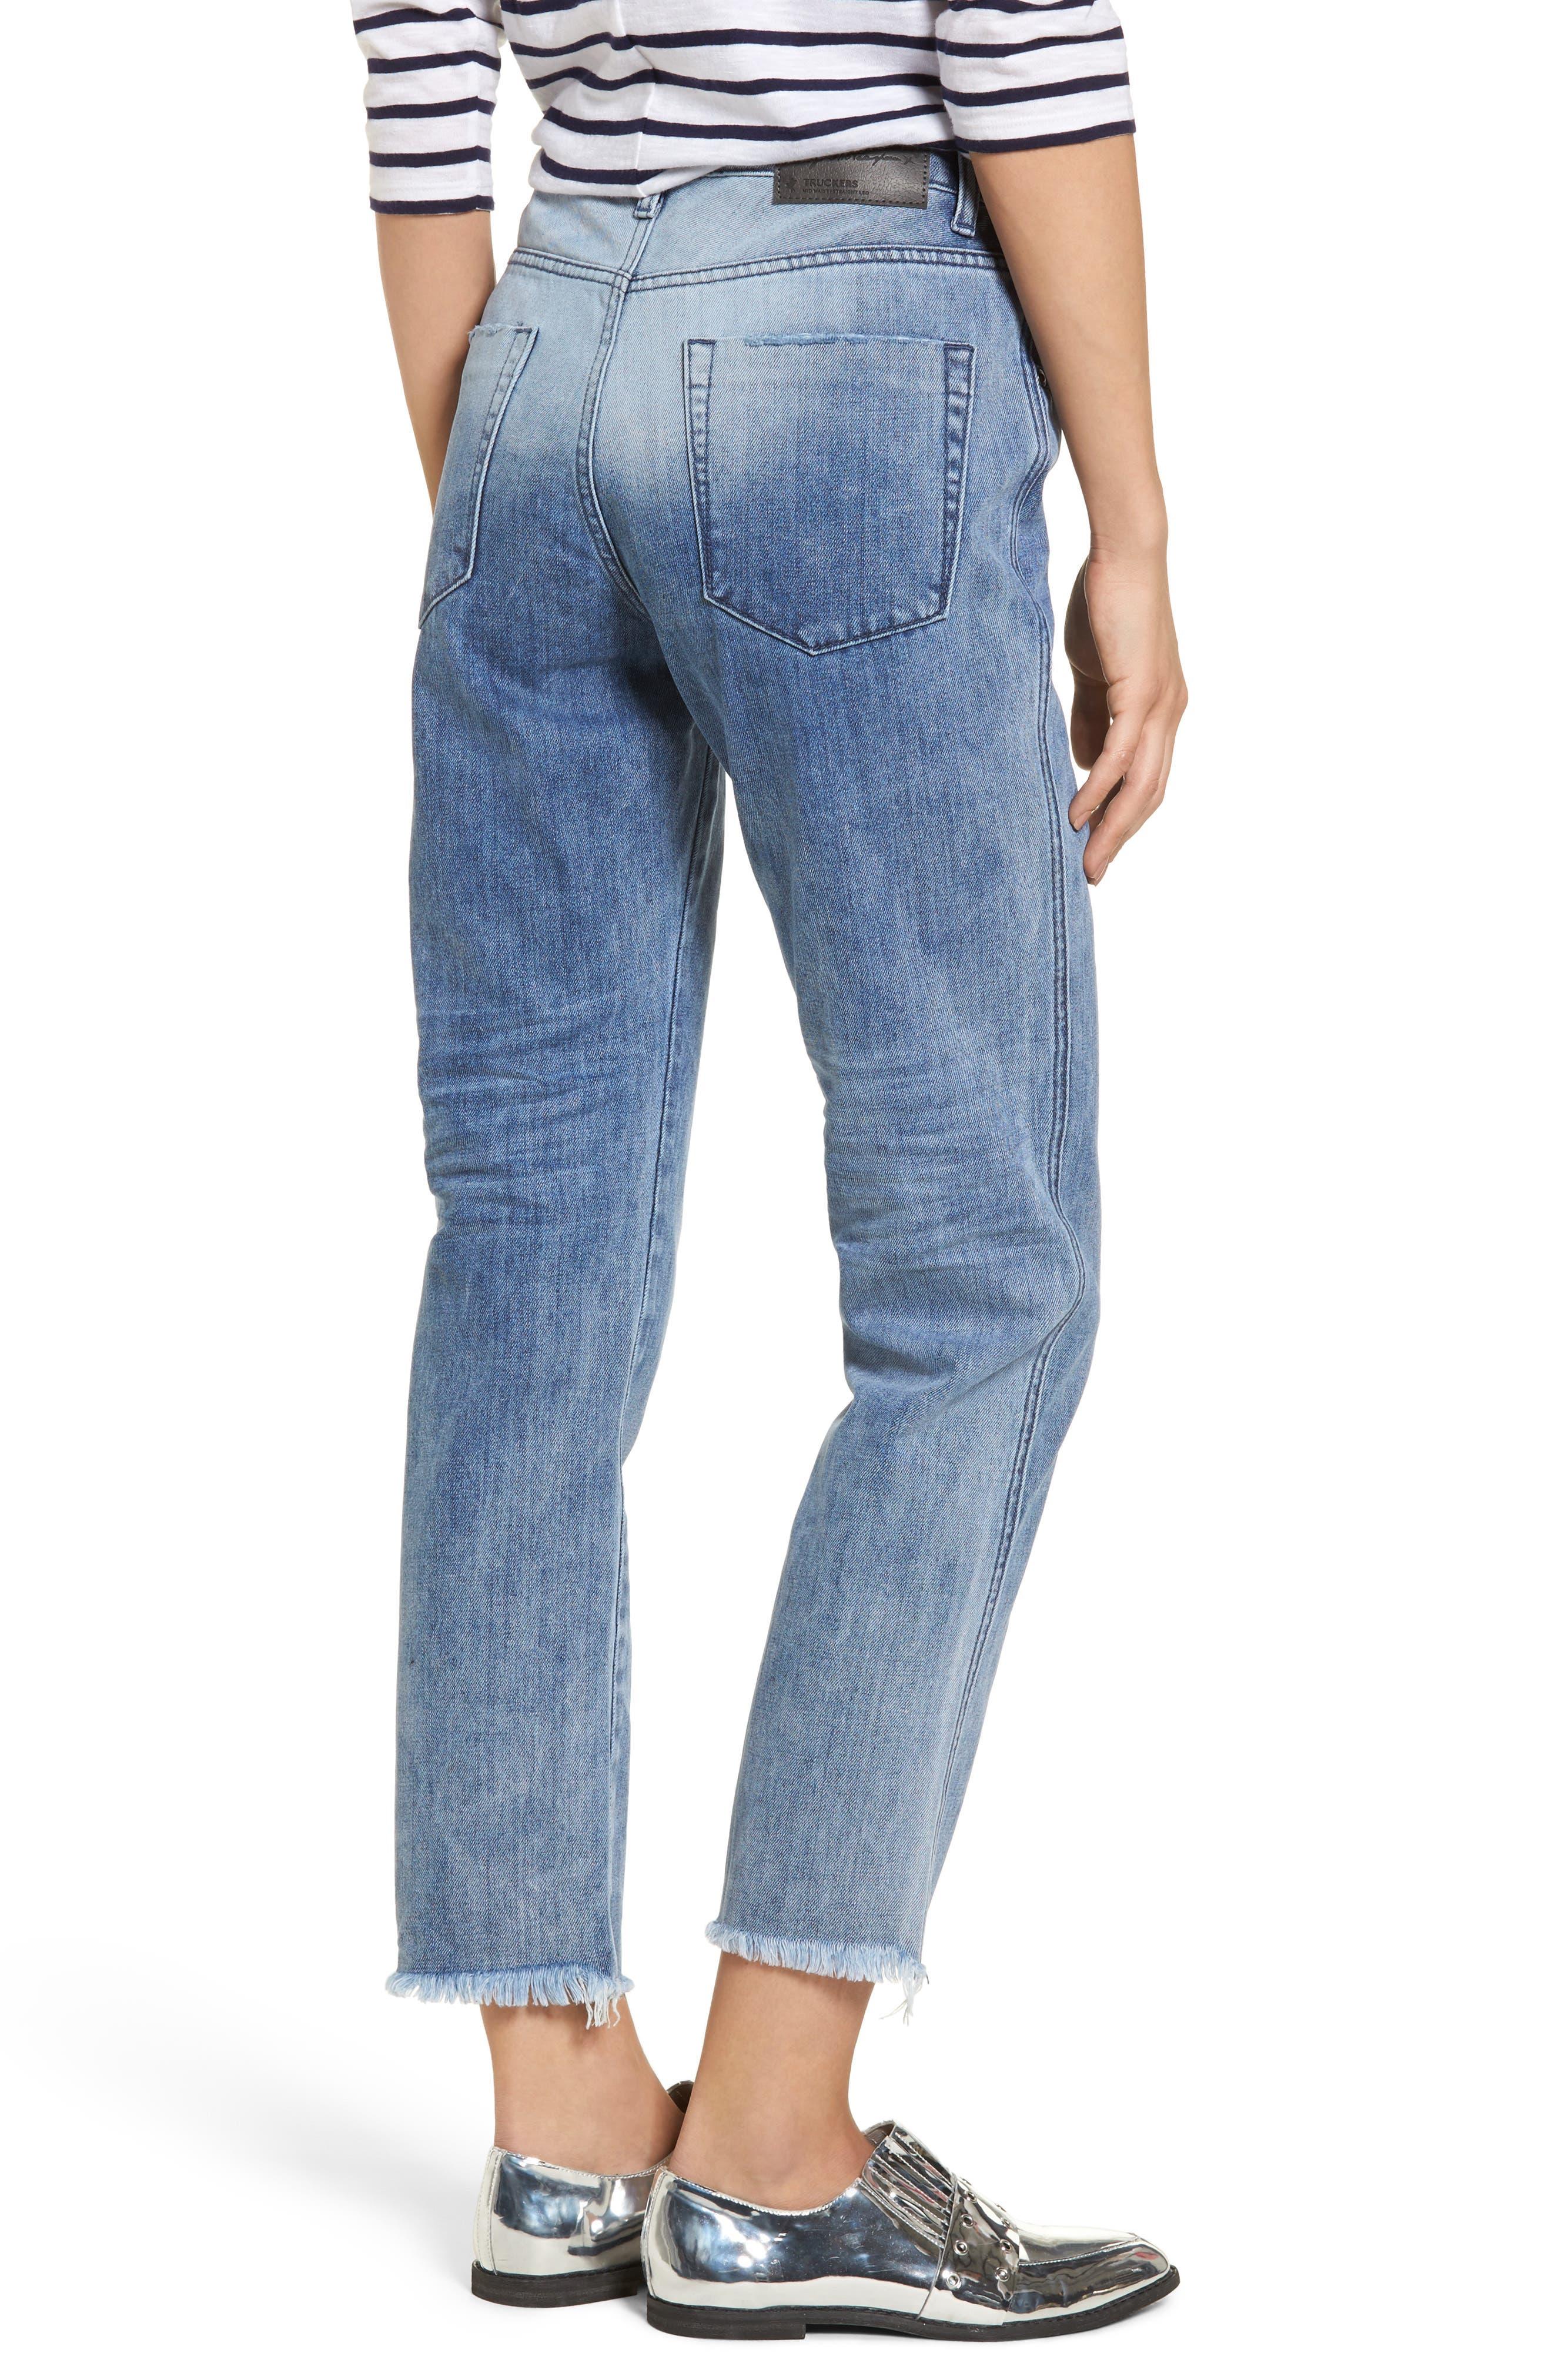 Tuckers High Waist Straight Leg Jeans,                             Alternate thumbnail 2, color,                             456